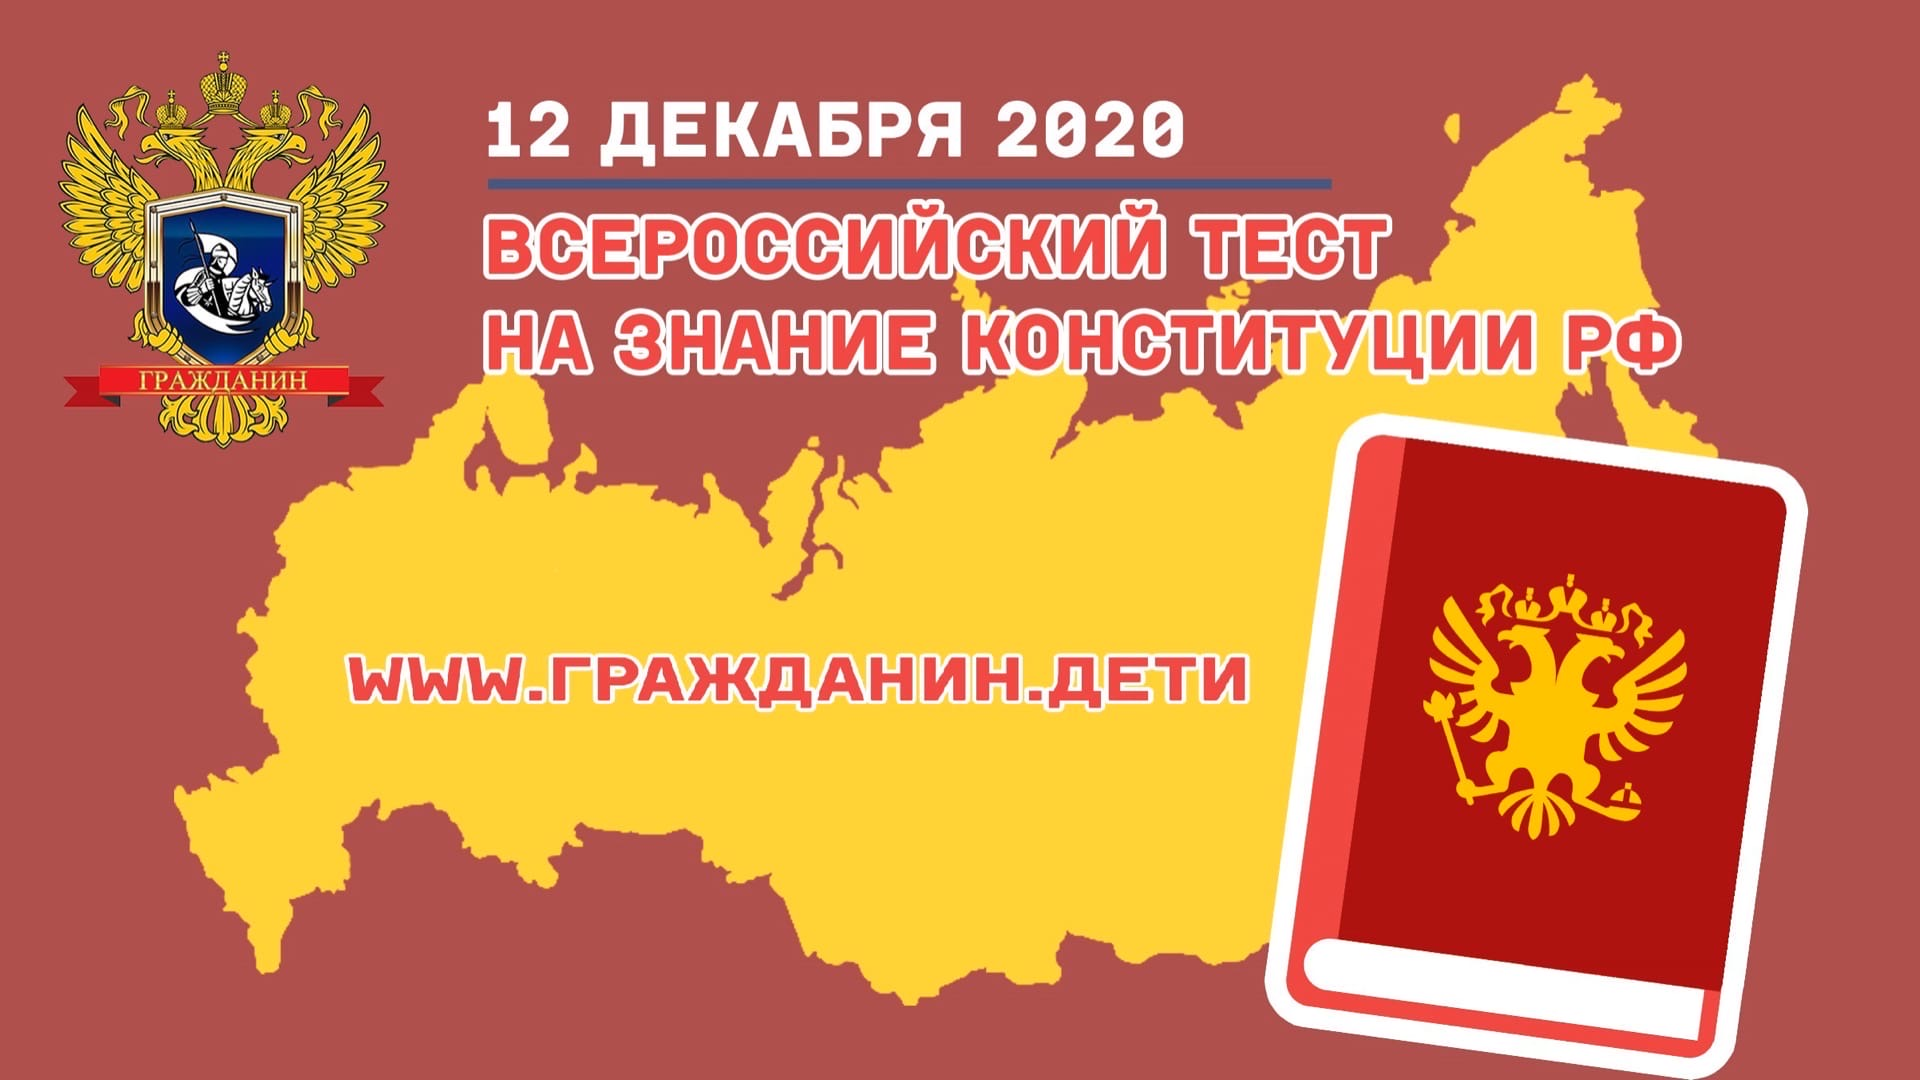 test Konstitutciia